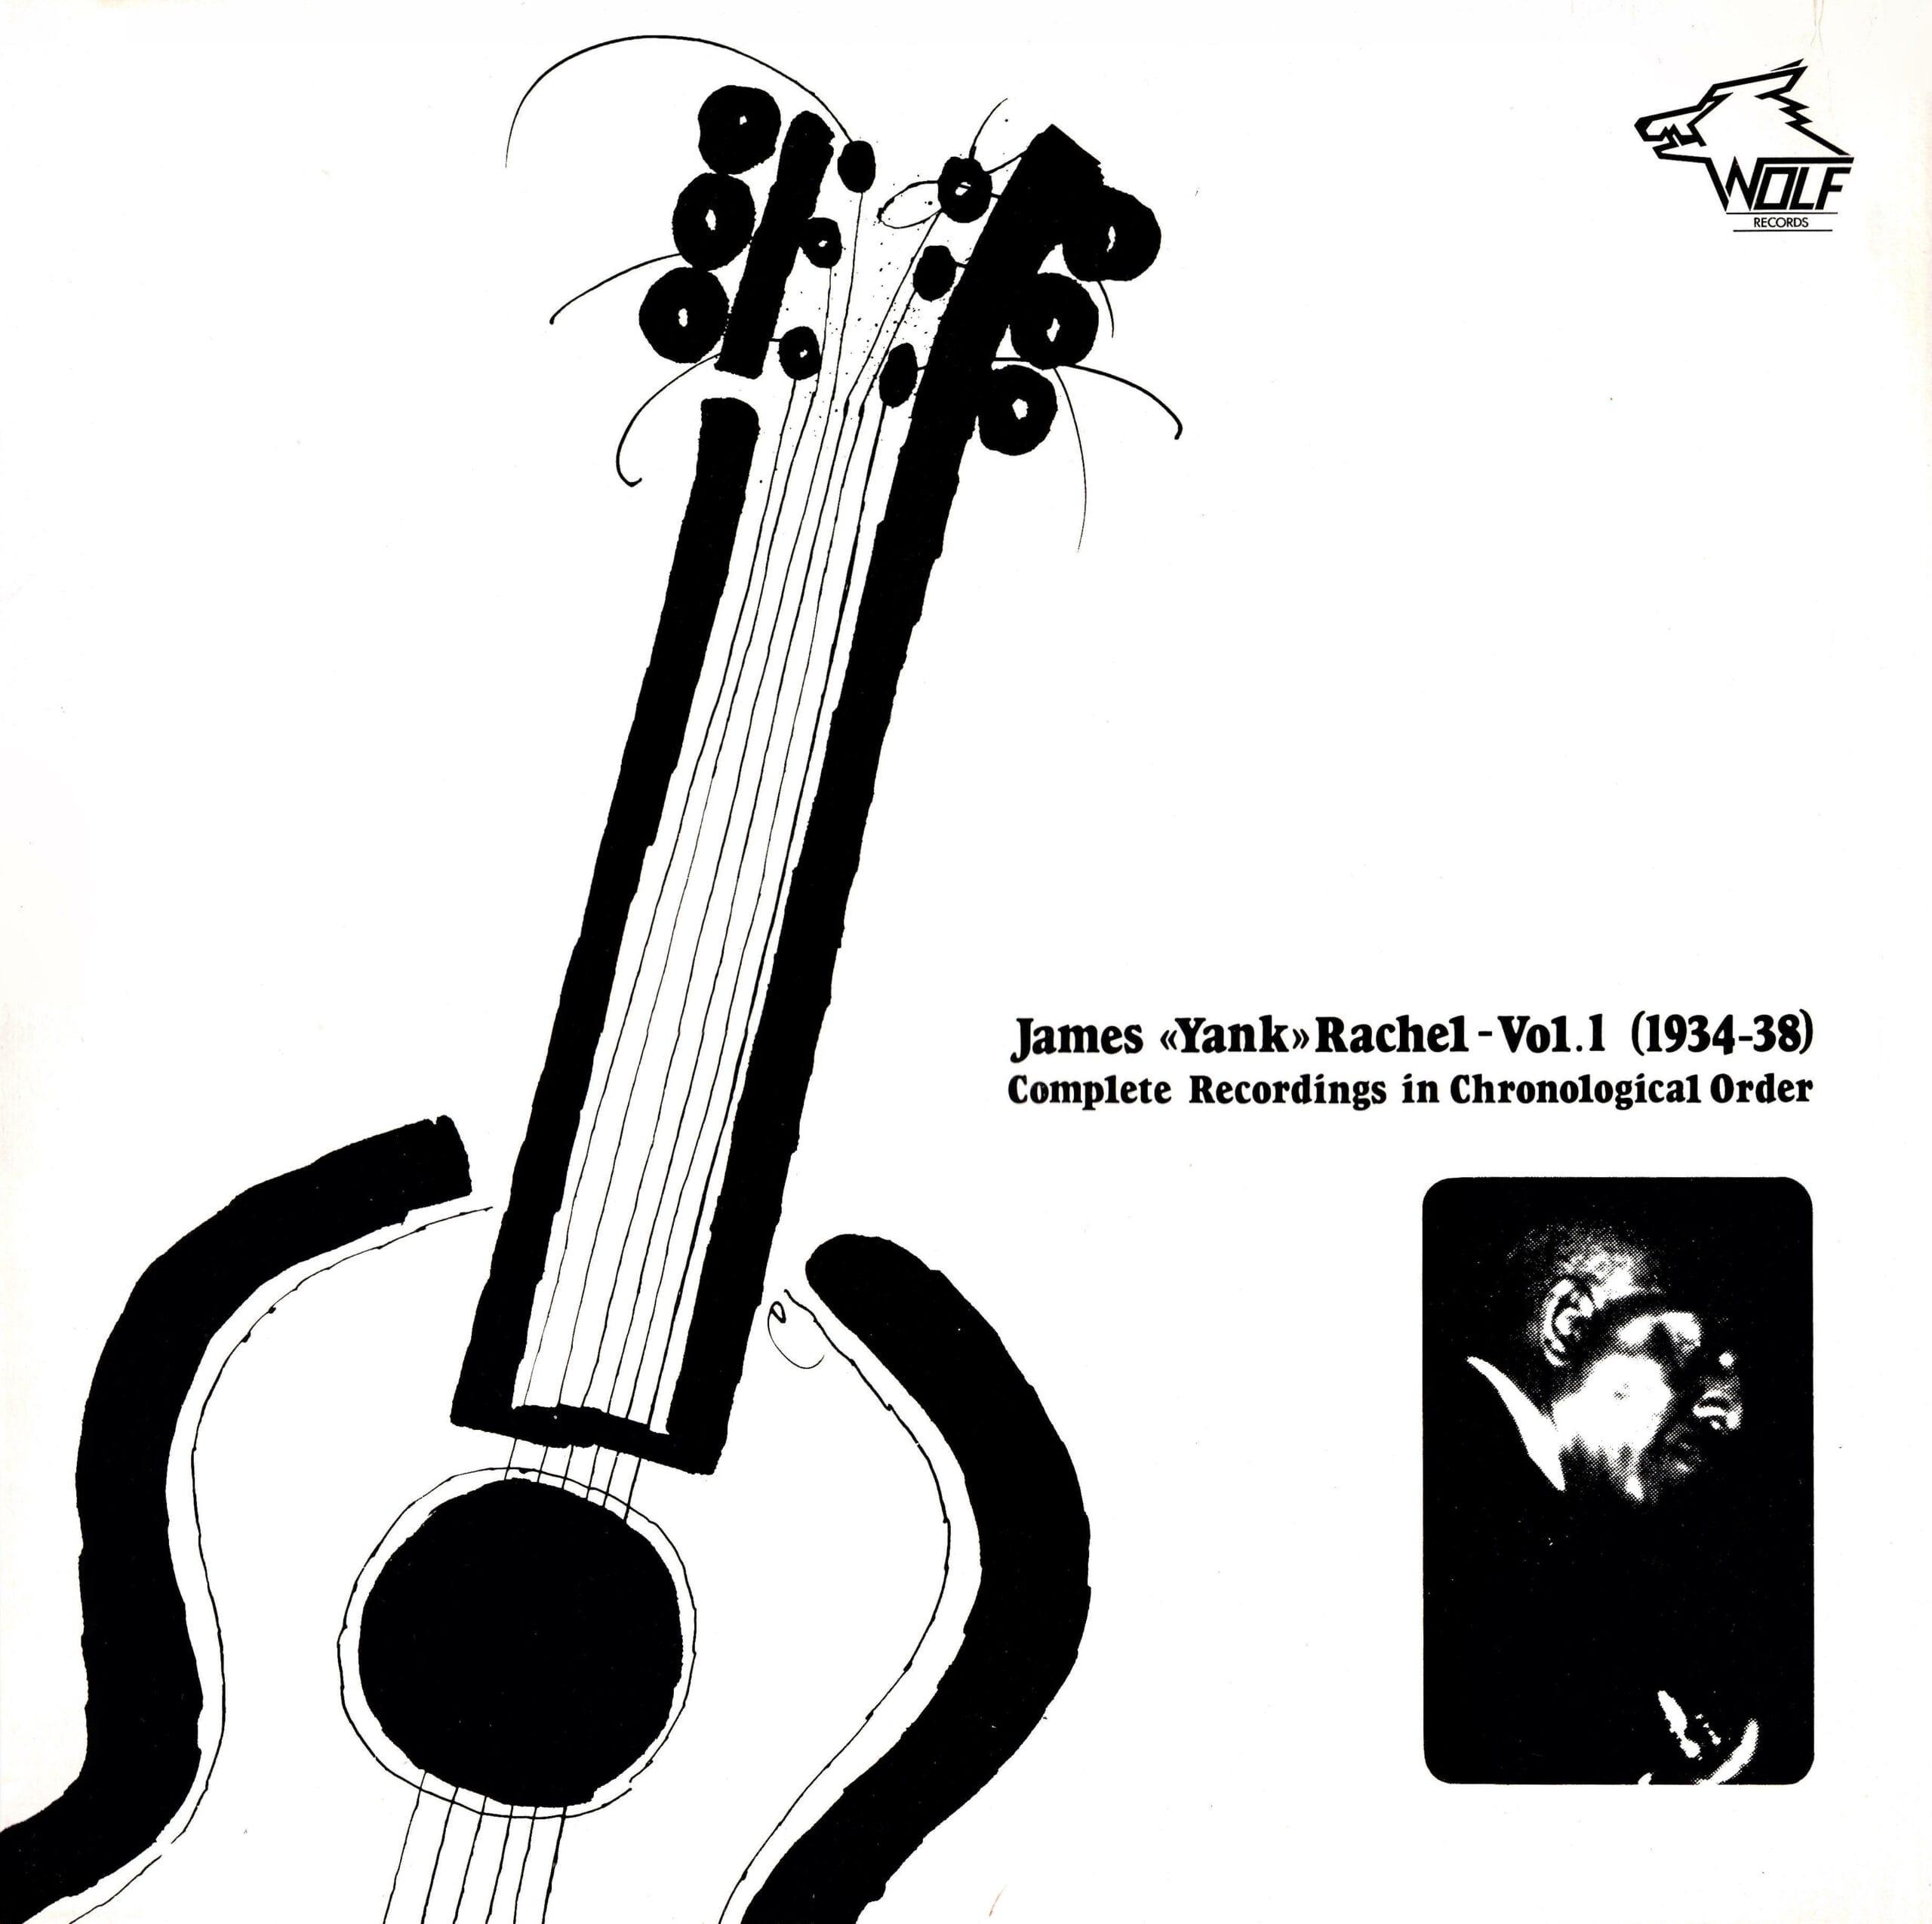 James Yank Rachel, Vol. 1 – 1